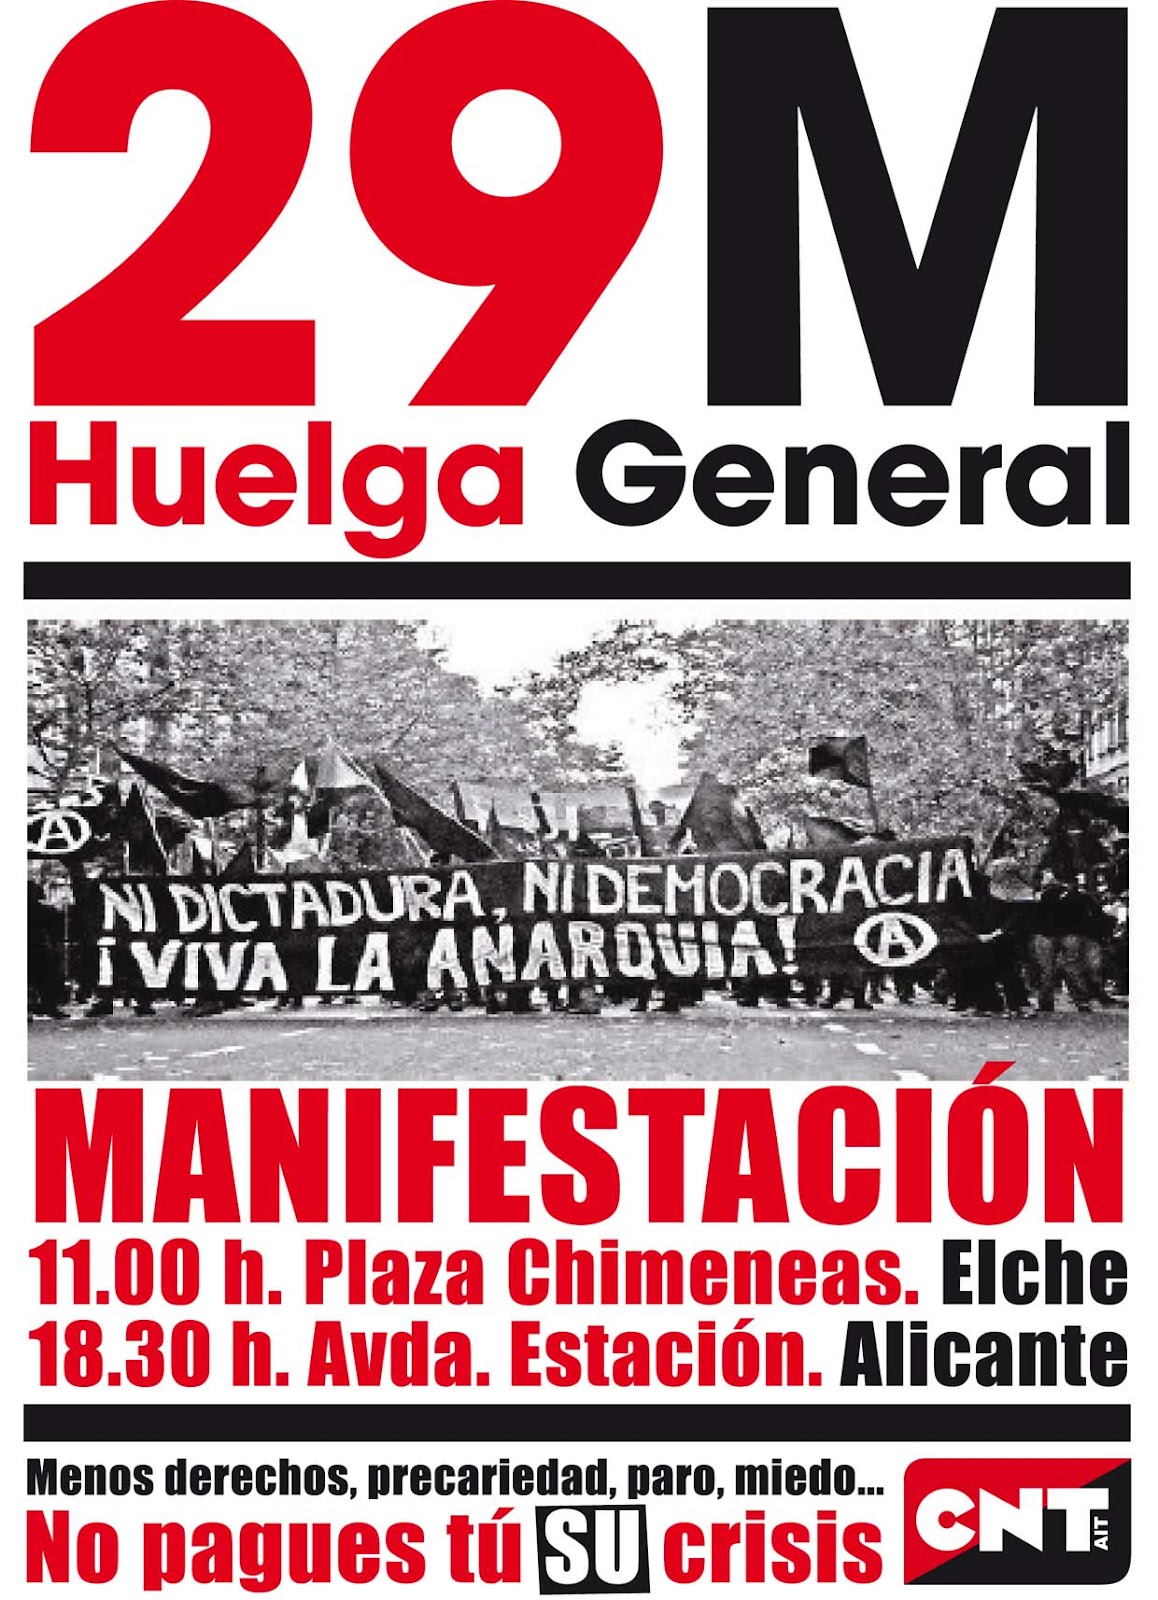 Cnt alacant huelga general 29 m unete al bloque anarquista - Chimeneas elche ...